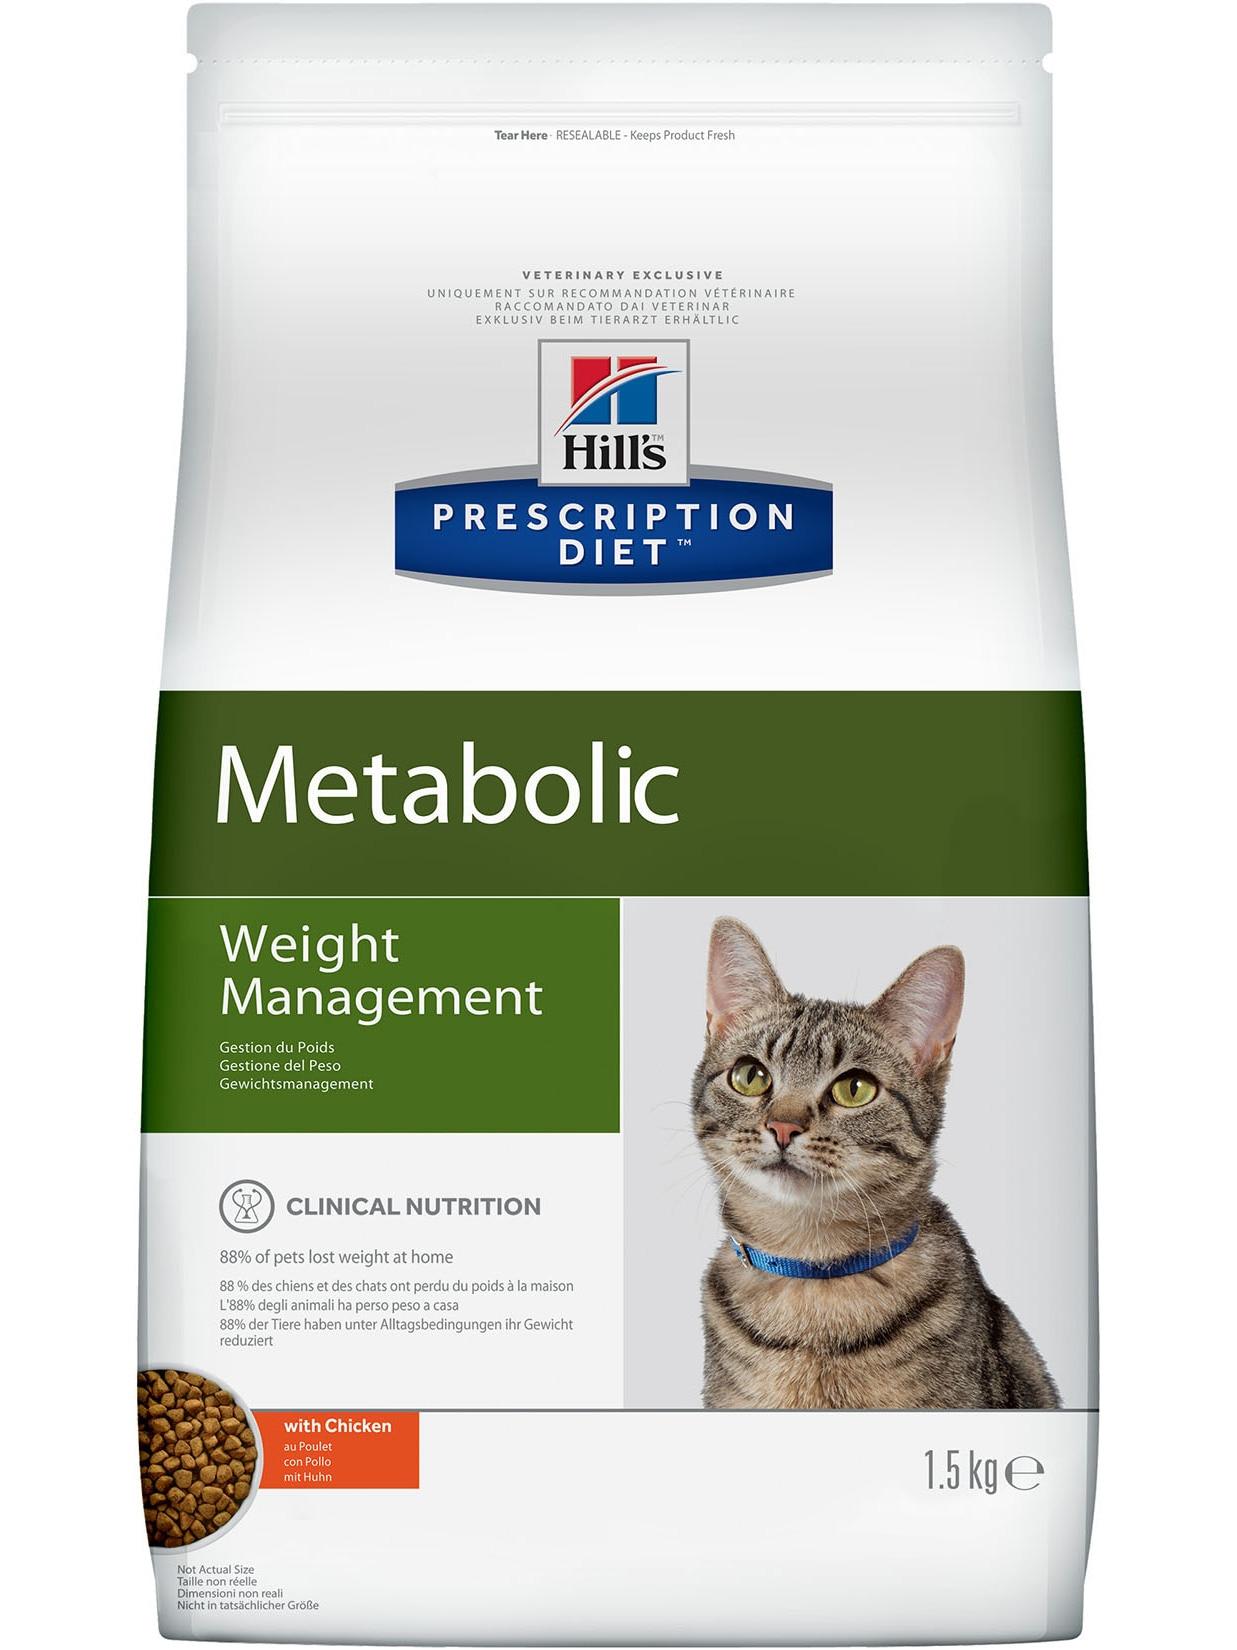 Hill's Prescription Diet Metabolic Weight Management Cat Food Diet For Weight 1,5 Kg